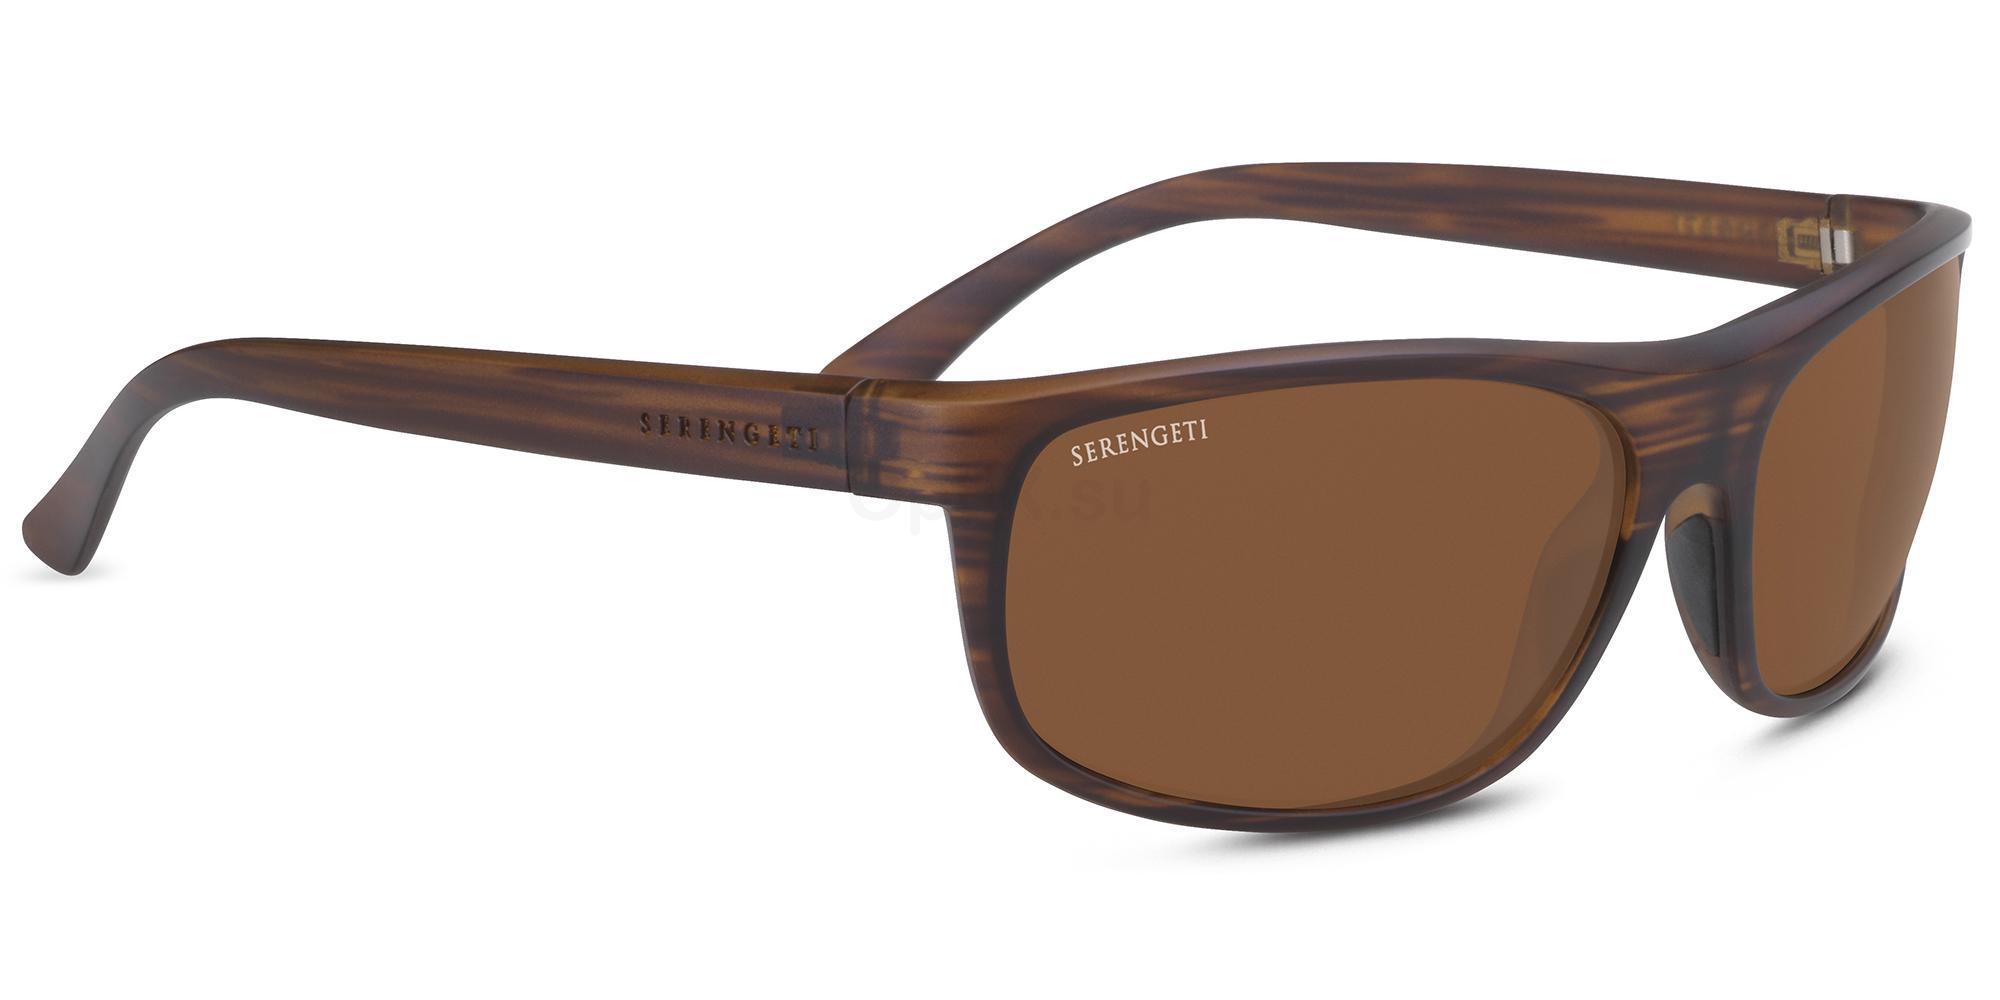 8972 ALESSIO Sunglasses, Serengeti